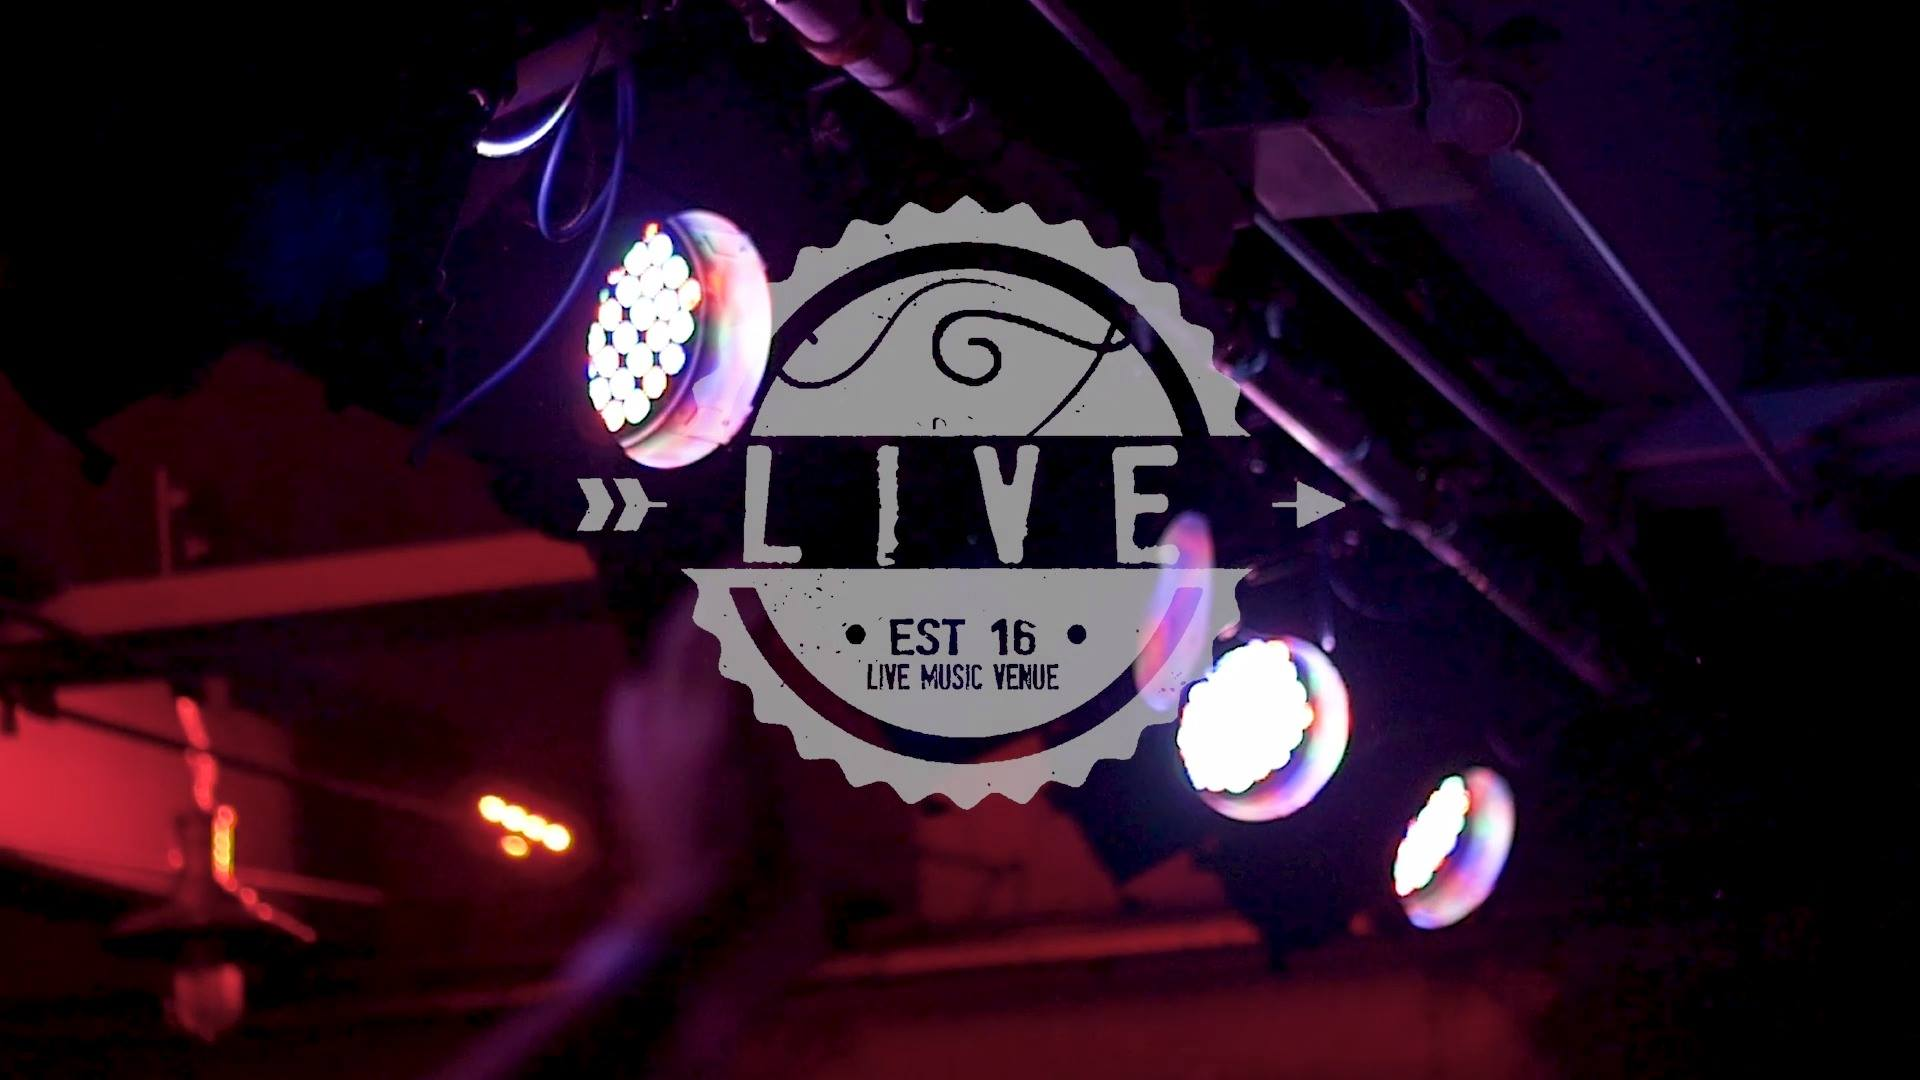 LiVE - Live Venue Promo